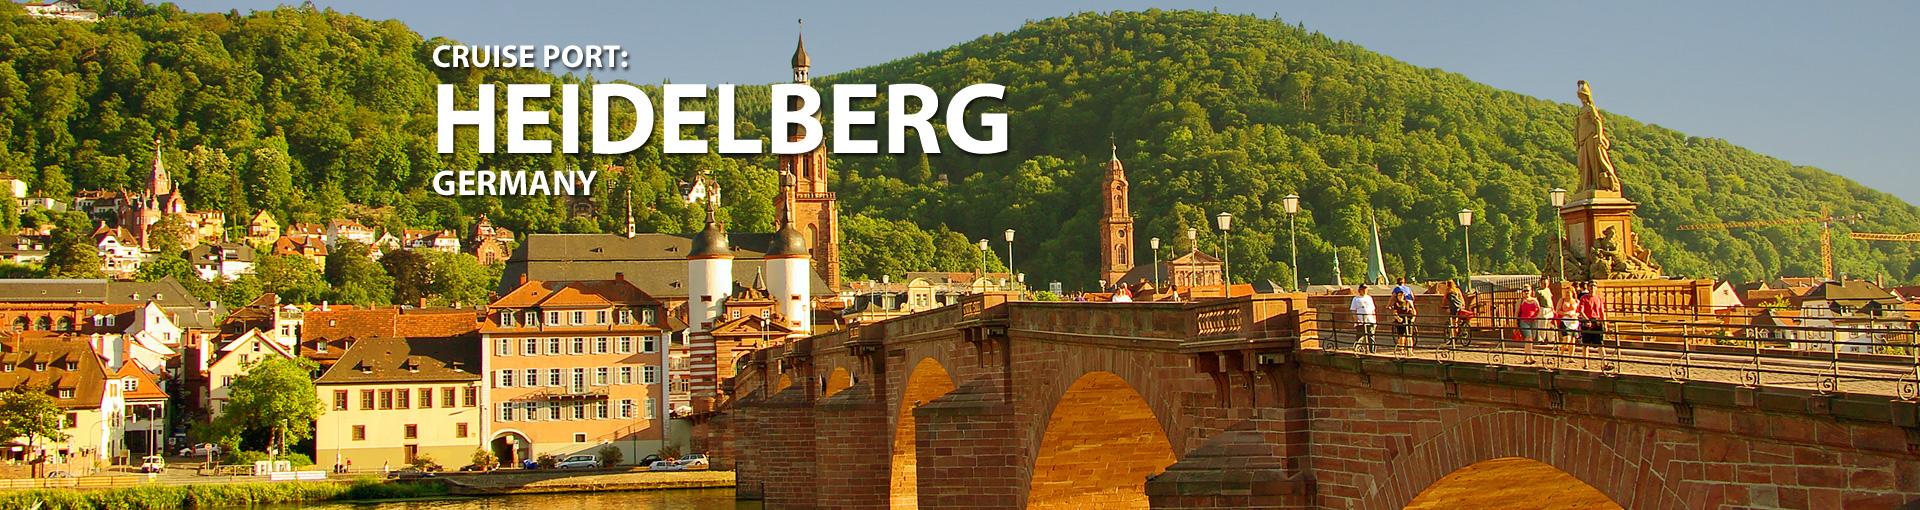 Cruises to Heidelberg,Germany